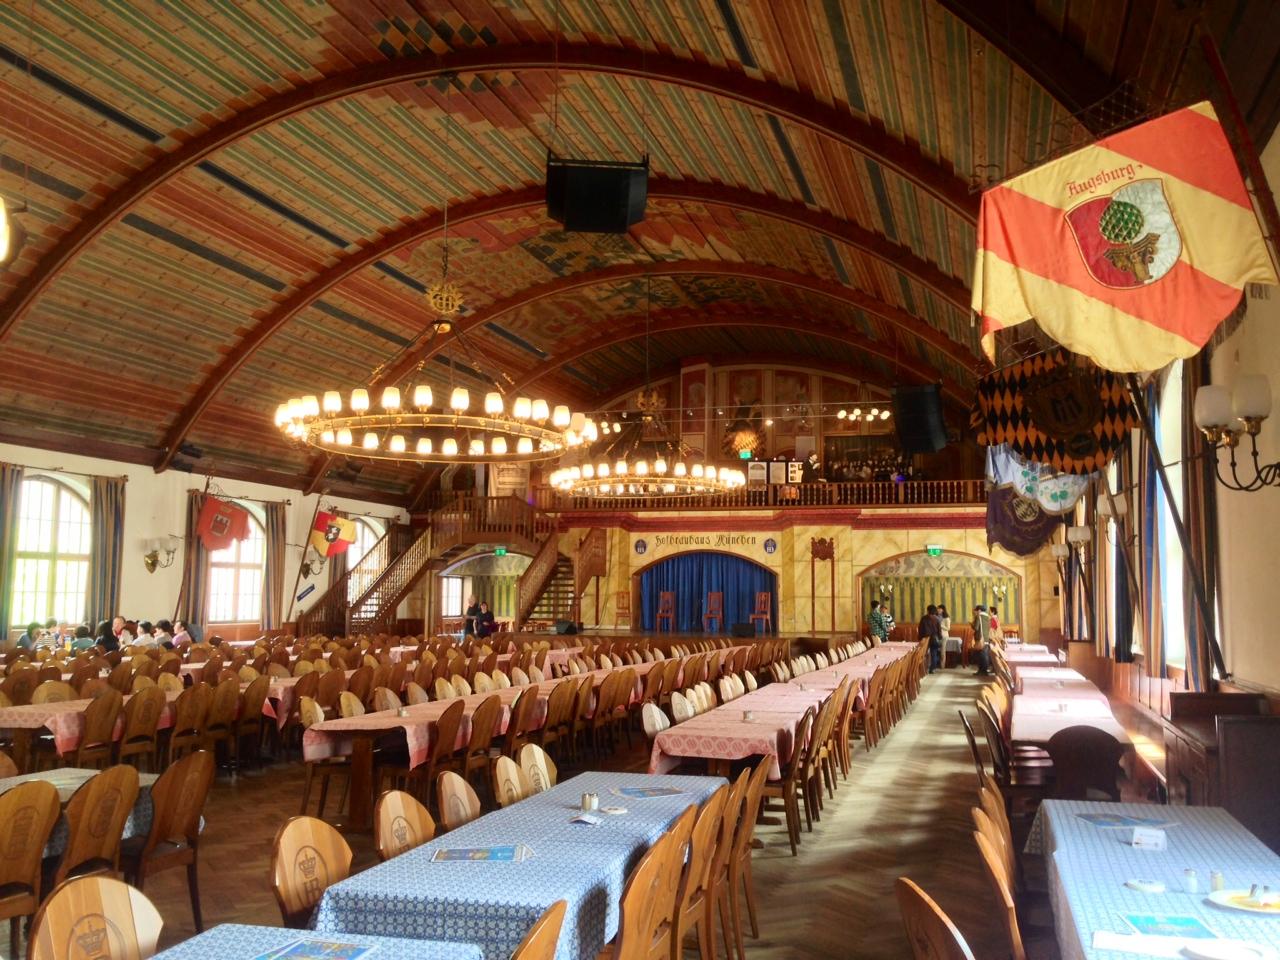 14. Salle de danse de la brasserie Hofbräuhaus